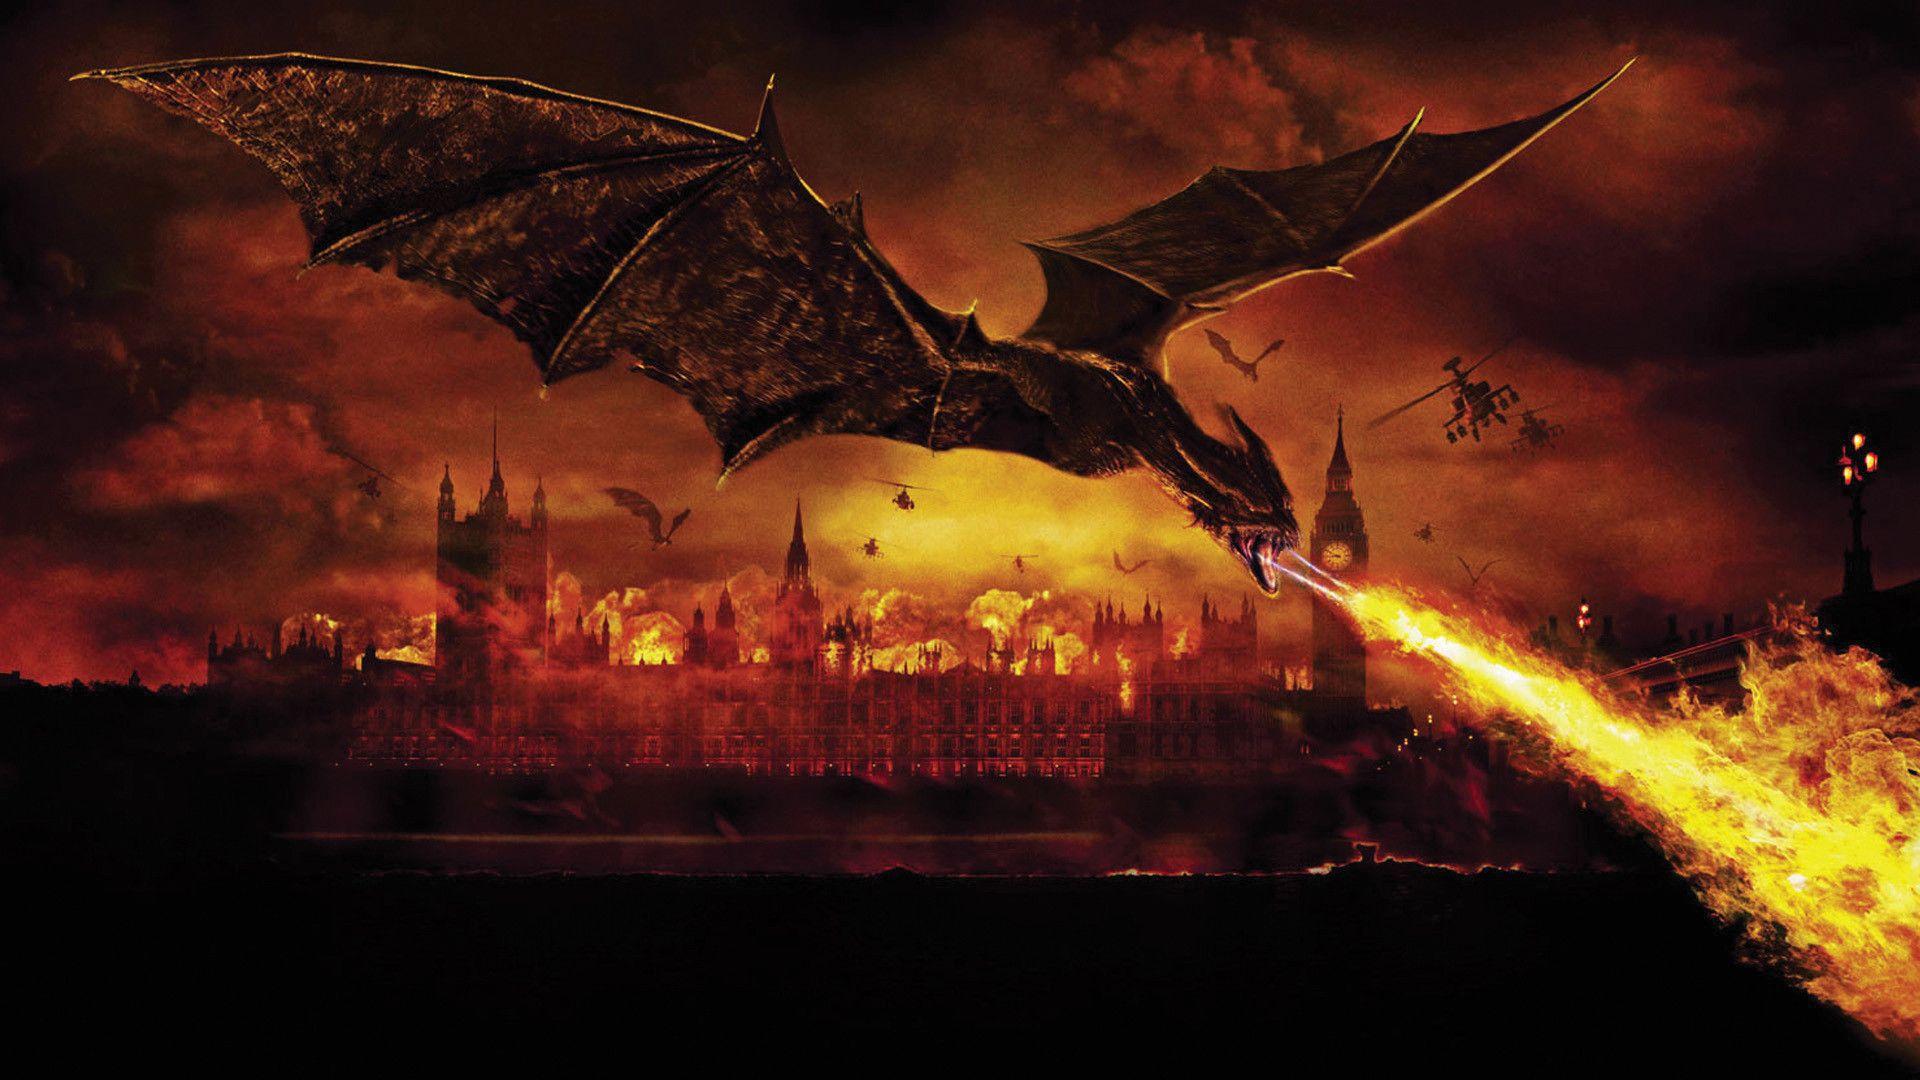 fire dragon photo